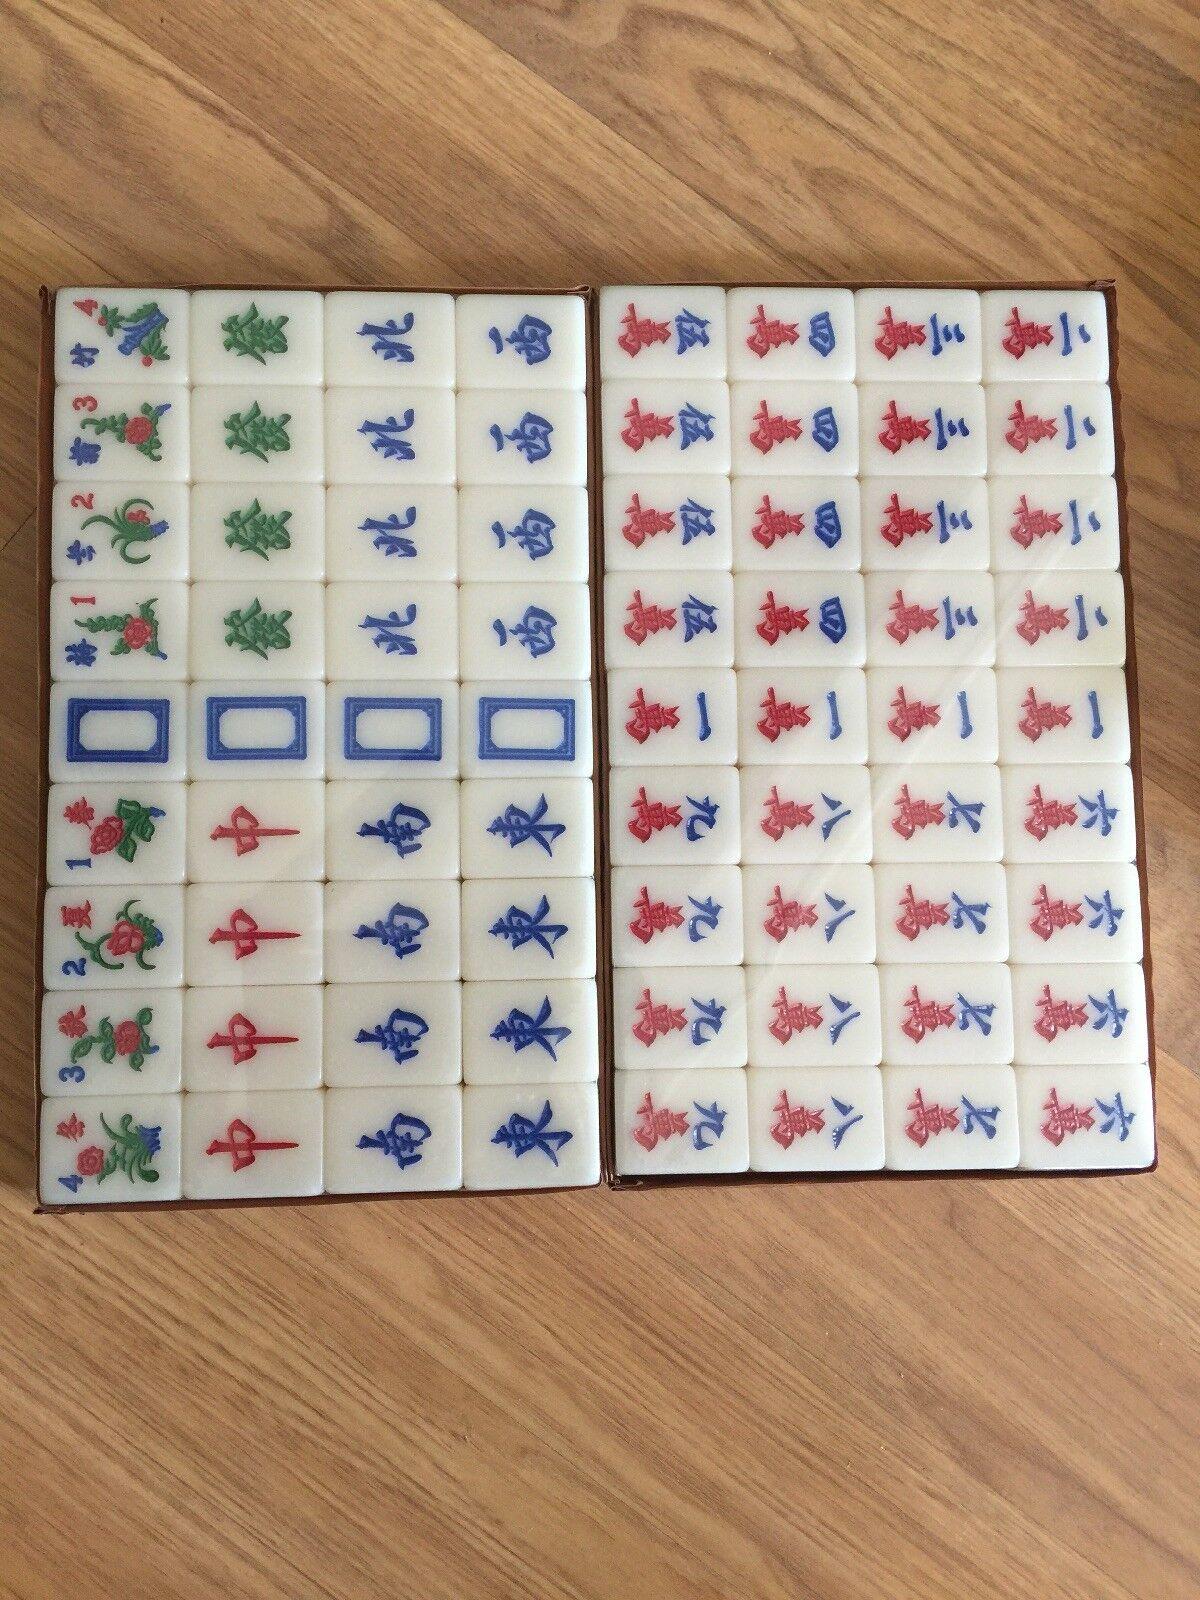 Vintage Majong Set with 144 Tiles in  a Marroneee Case  risparmia fino al 50%